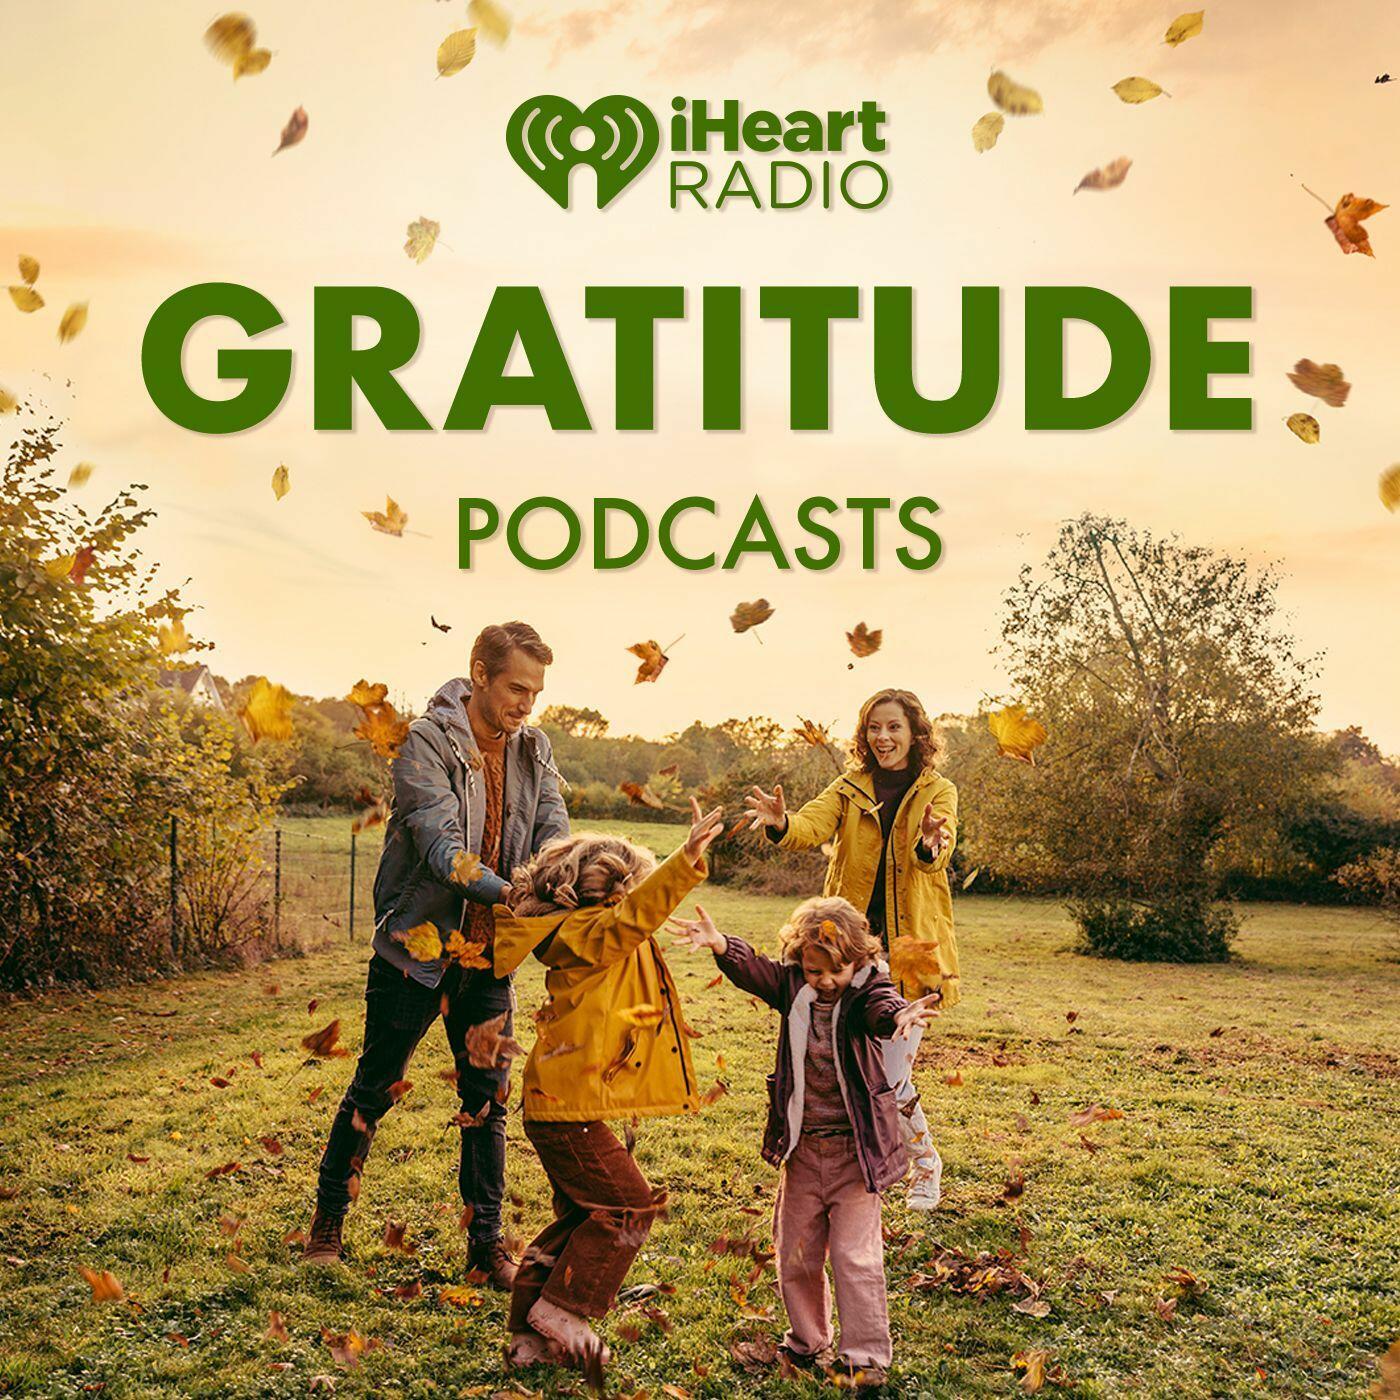 Gratitude Podcasts